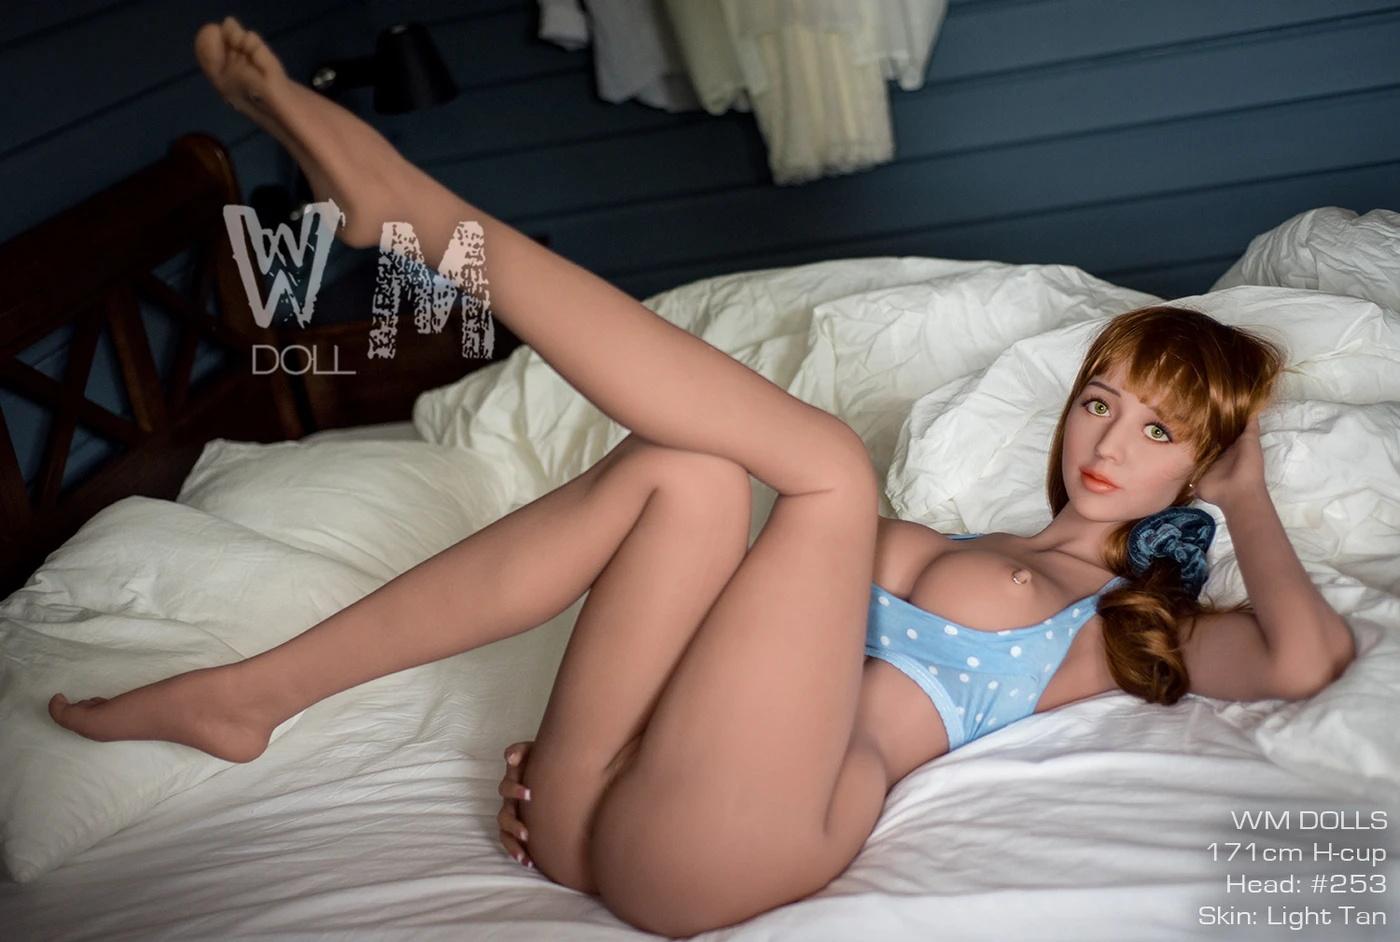 Sexdollie-171cm-sex-doll-17100324